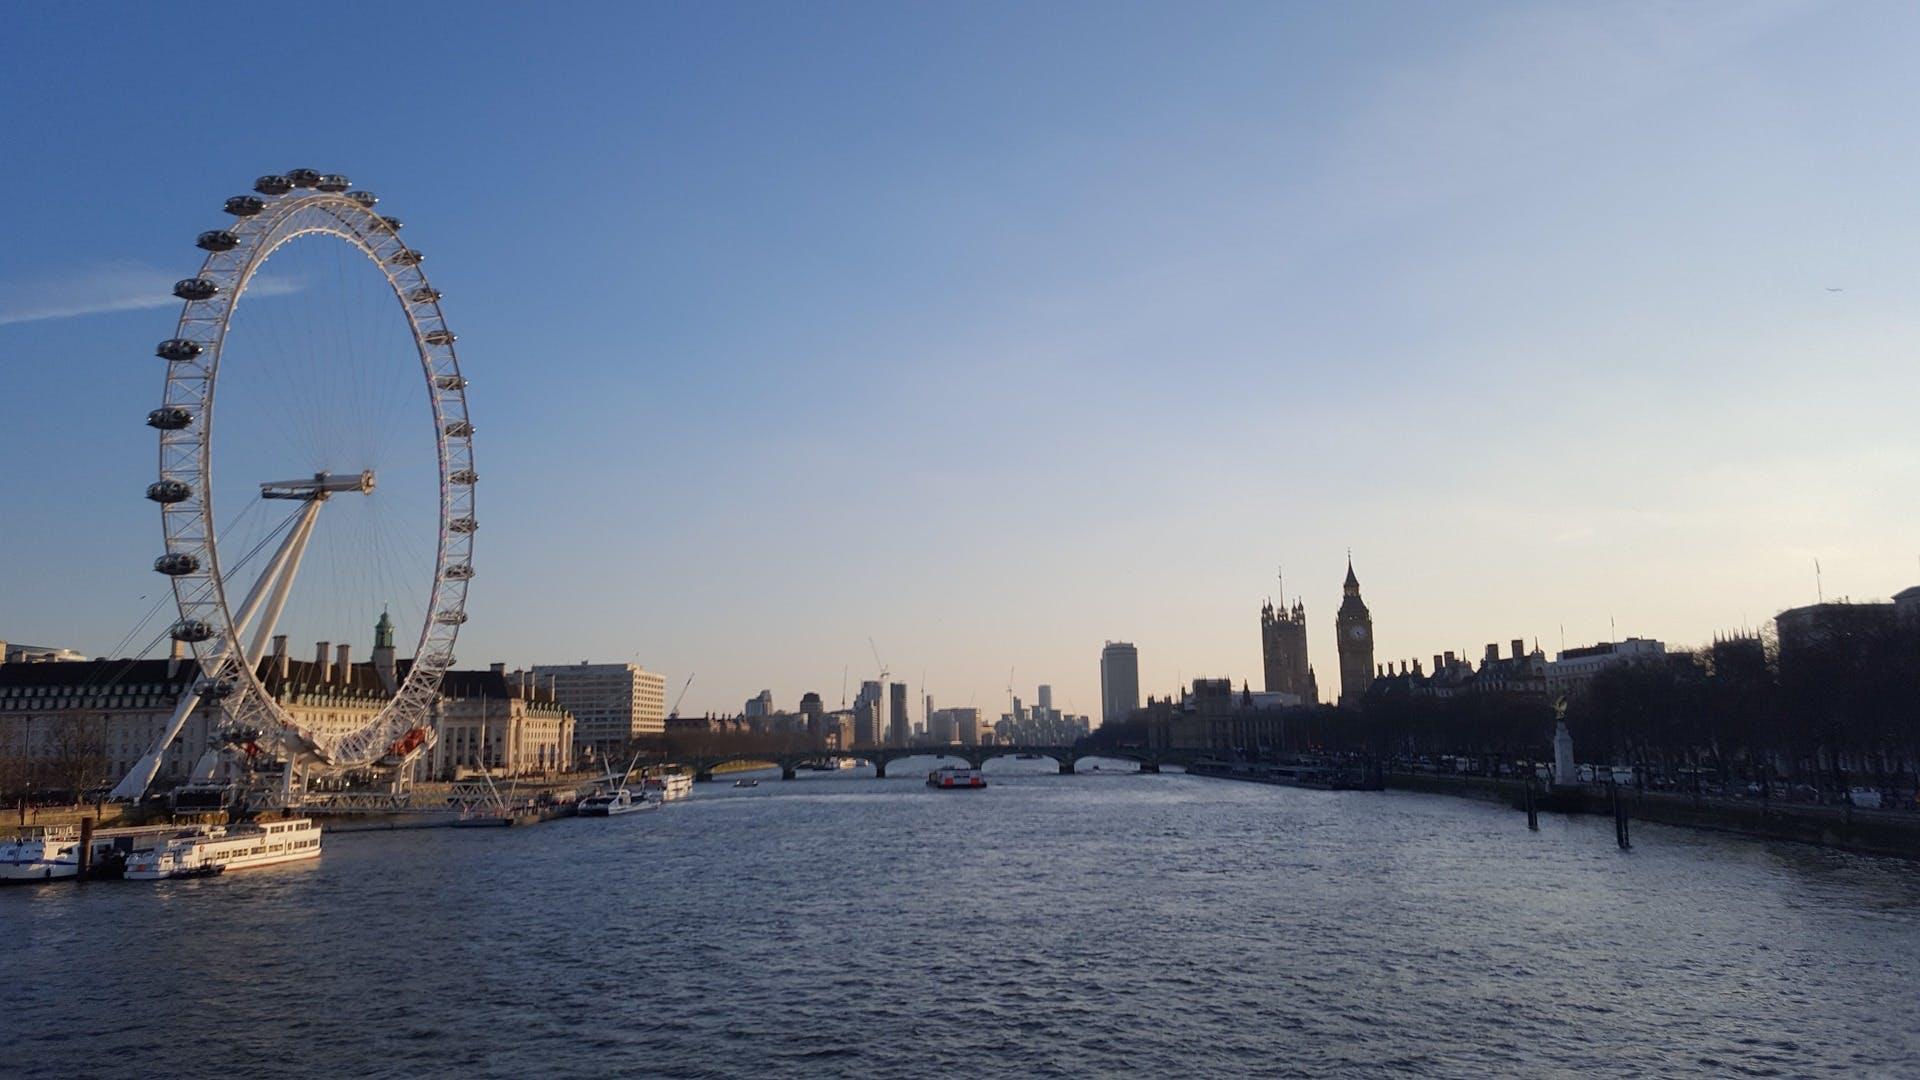 efterårsferie storby ferie shopping london